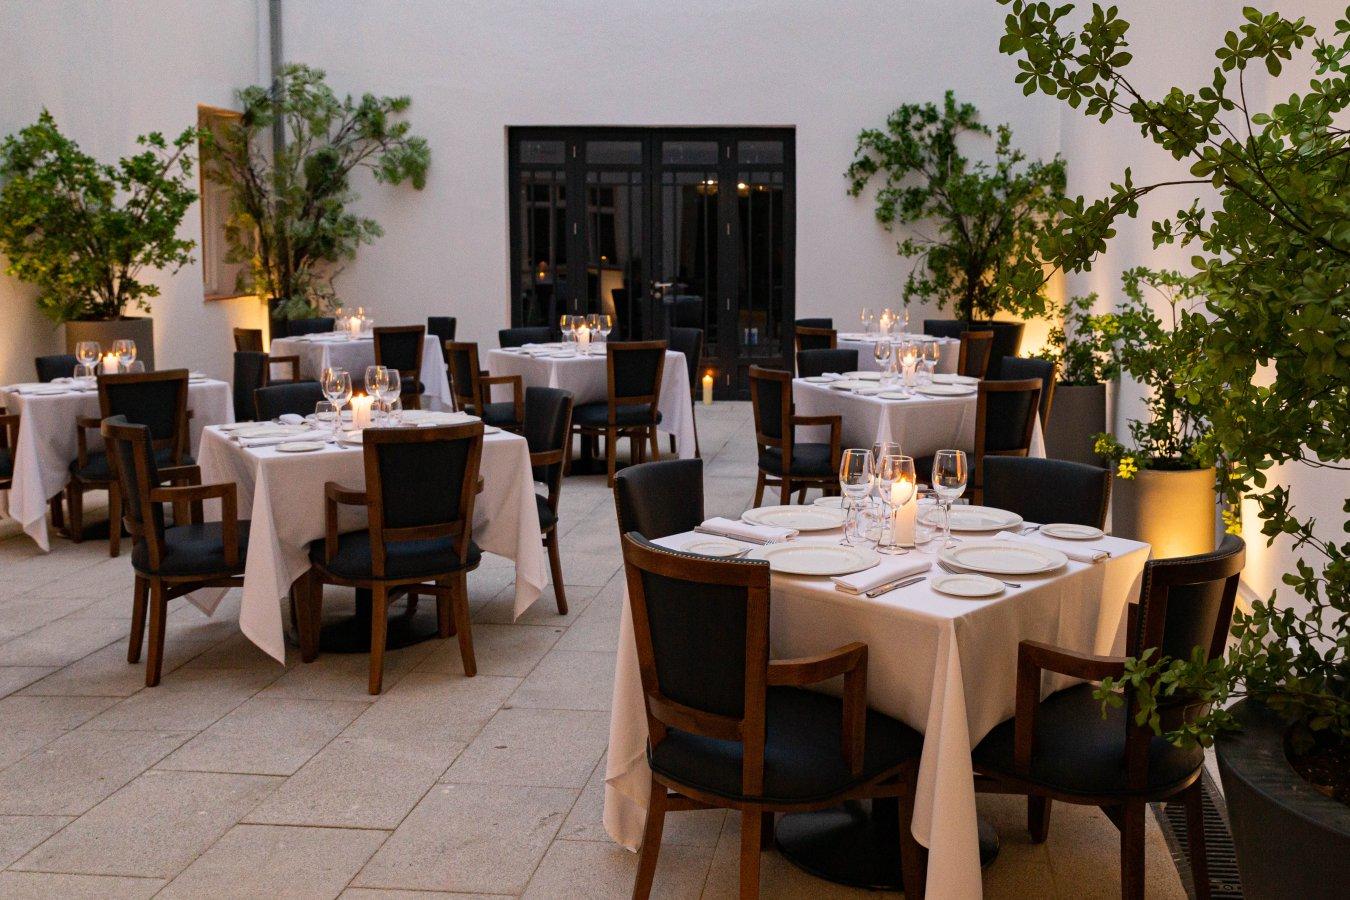 la-ancha - madrid restaurants